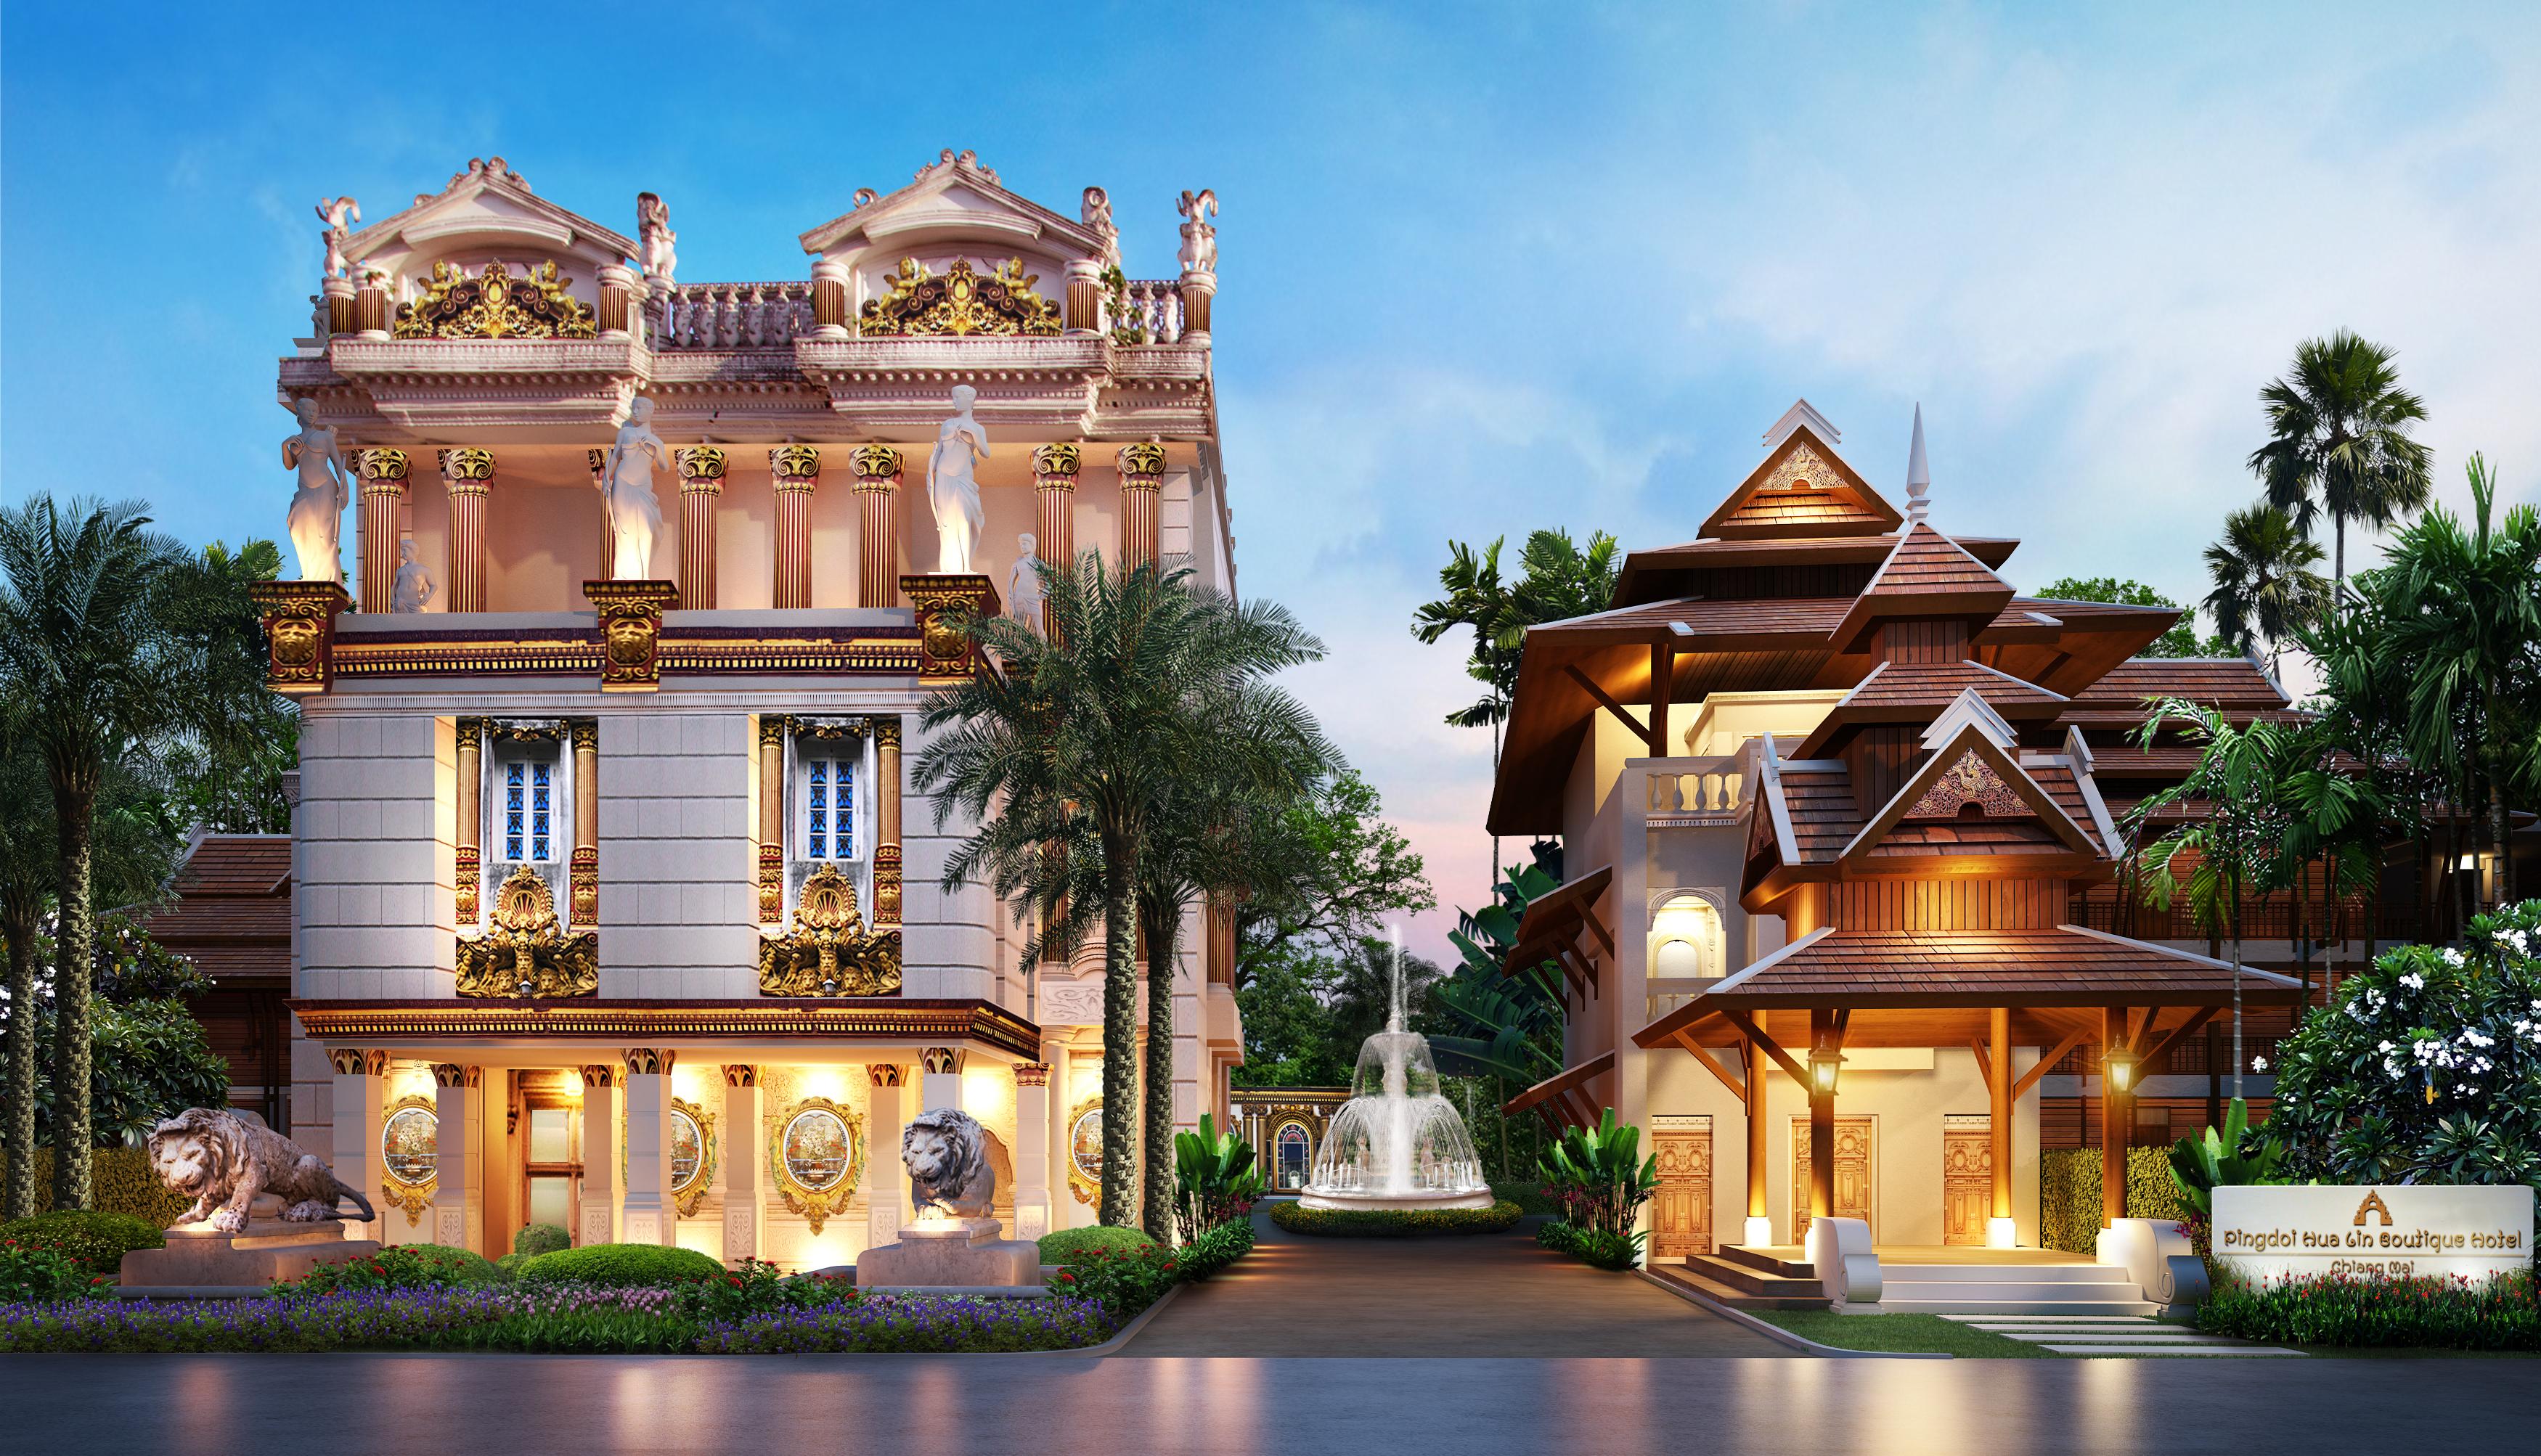 Hotel_Hotel-Entrance_Final